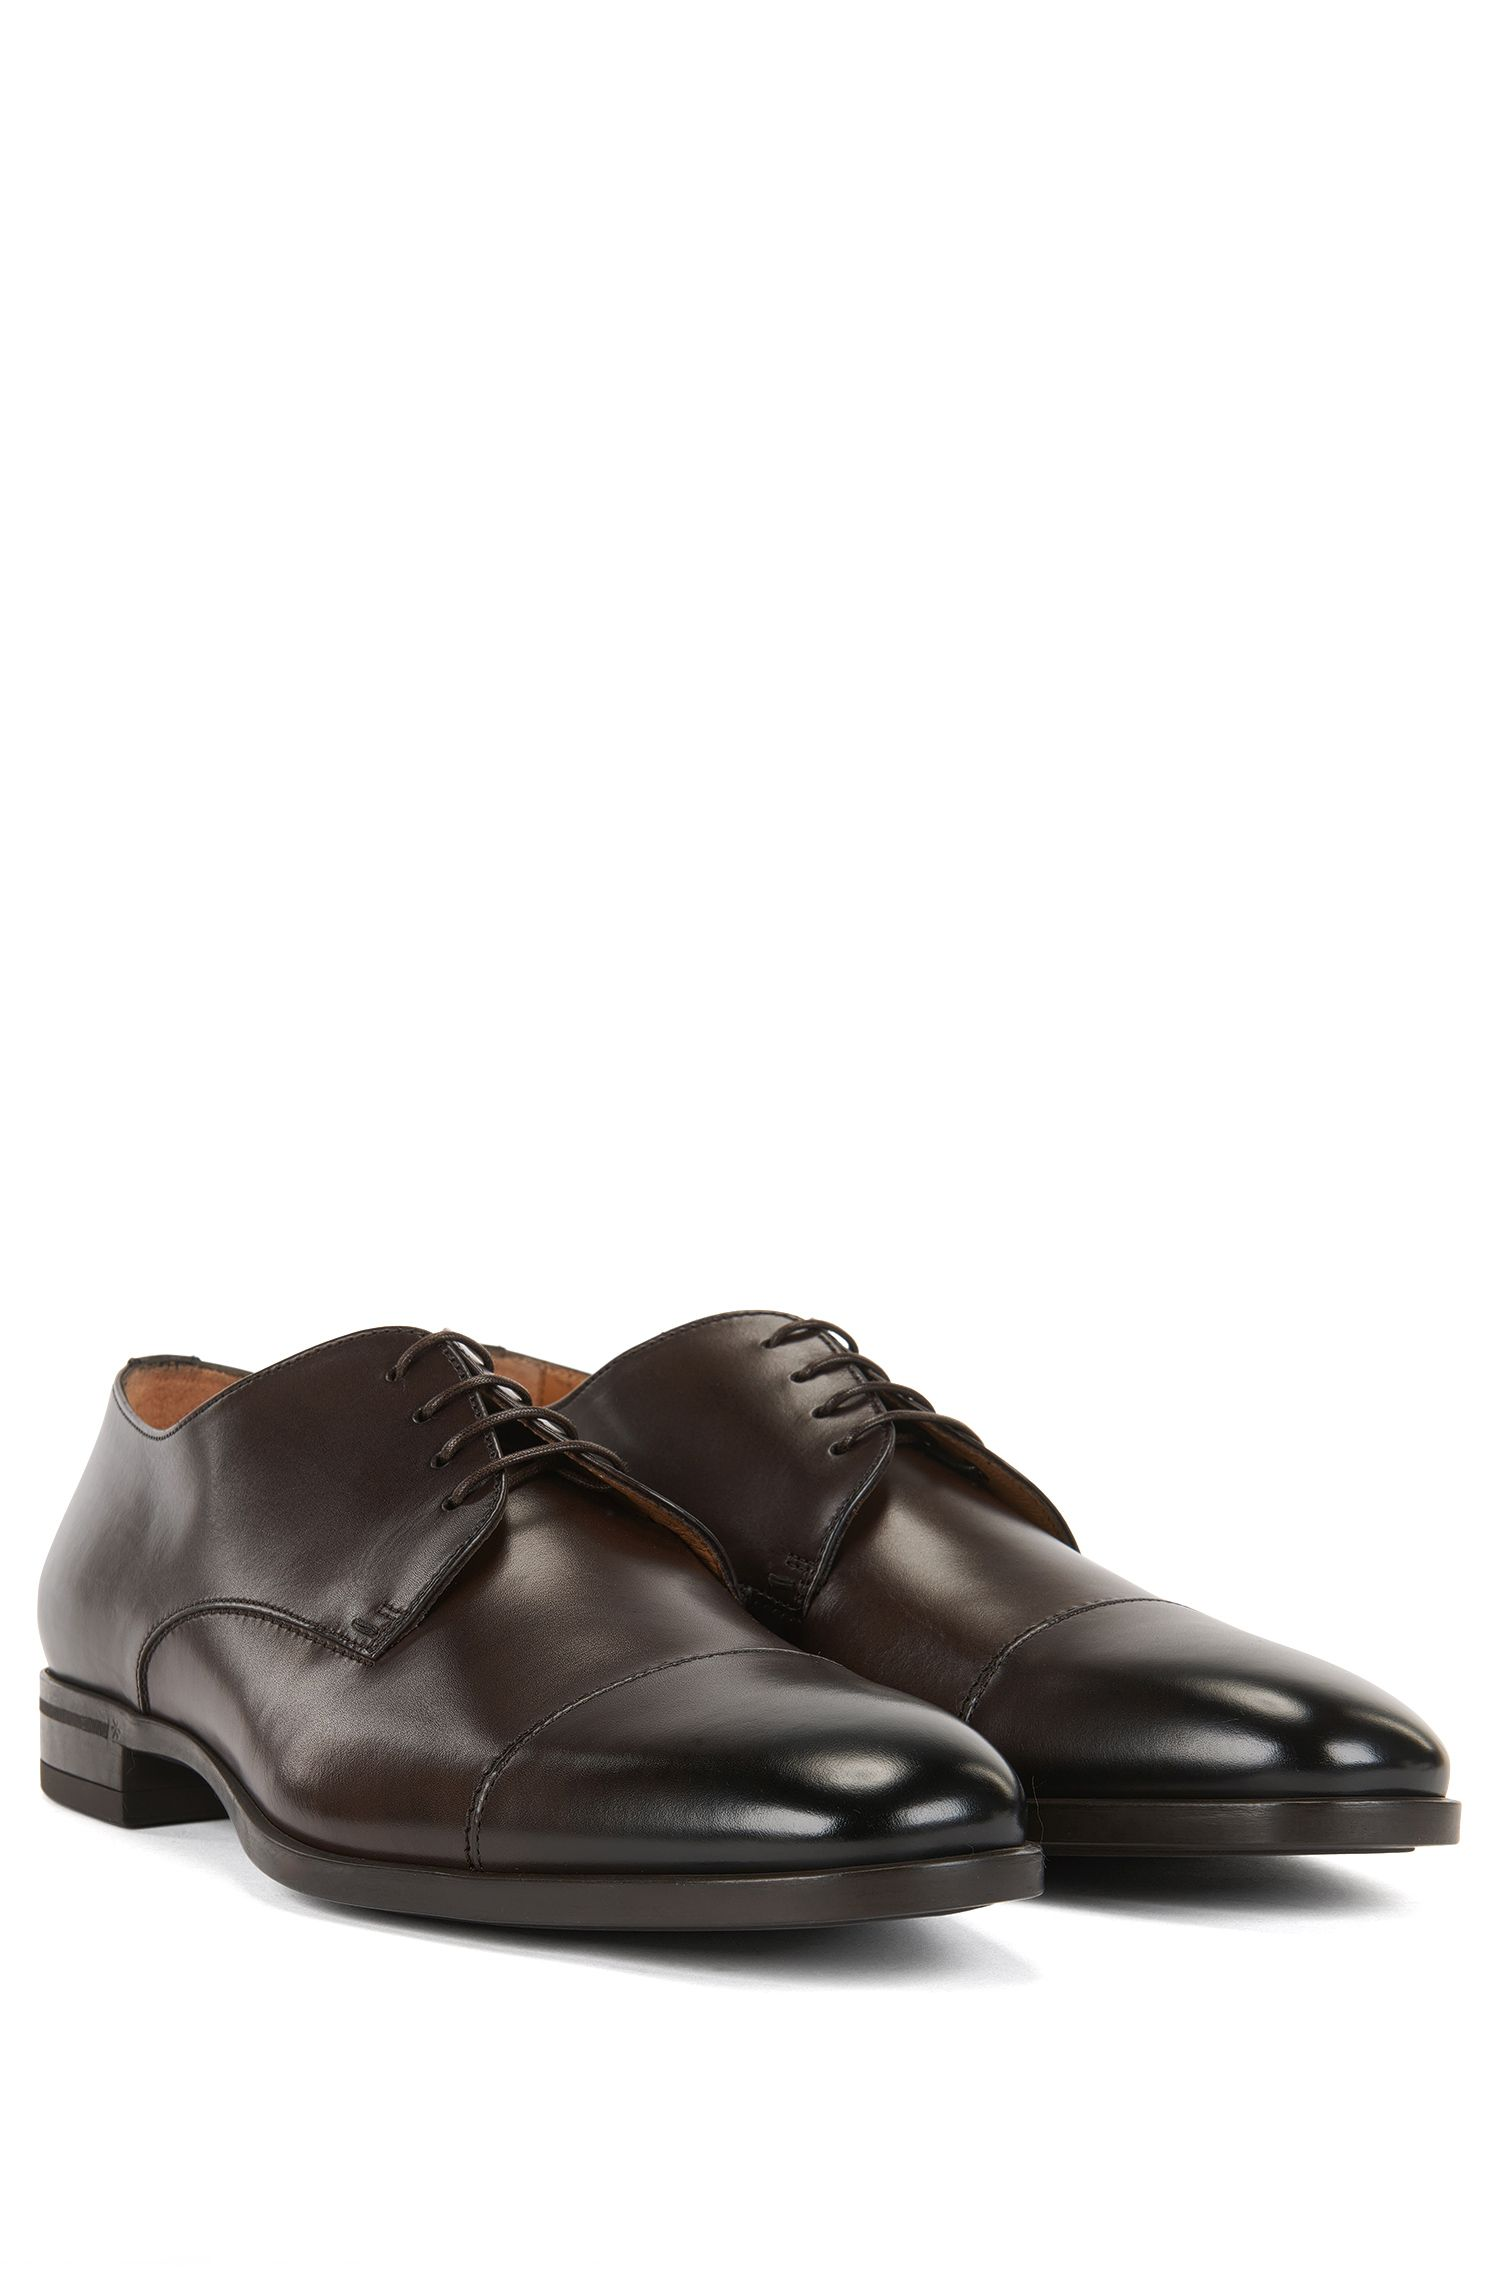 Cap-Toe Derby Shoe | Kensington